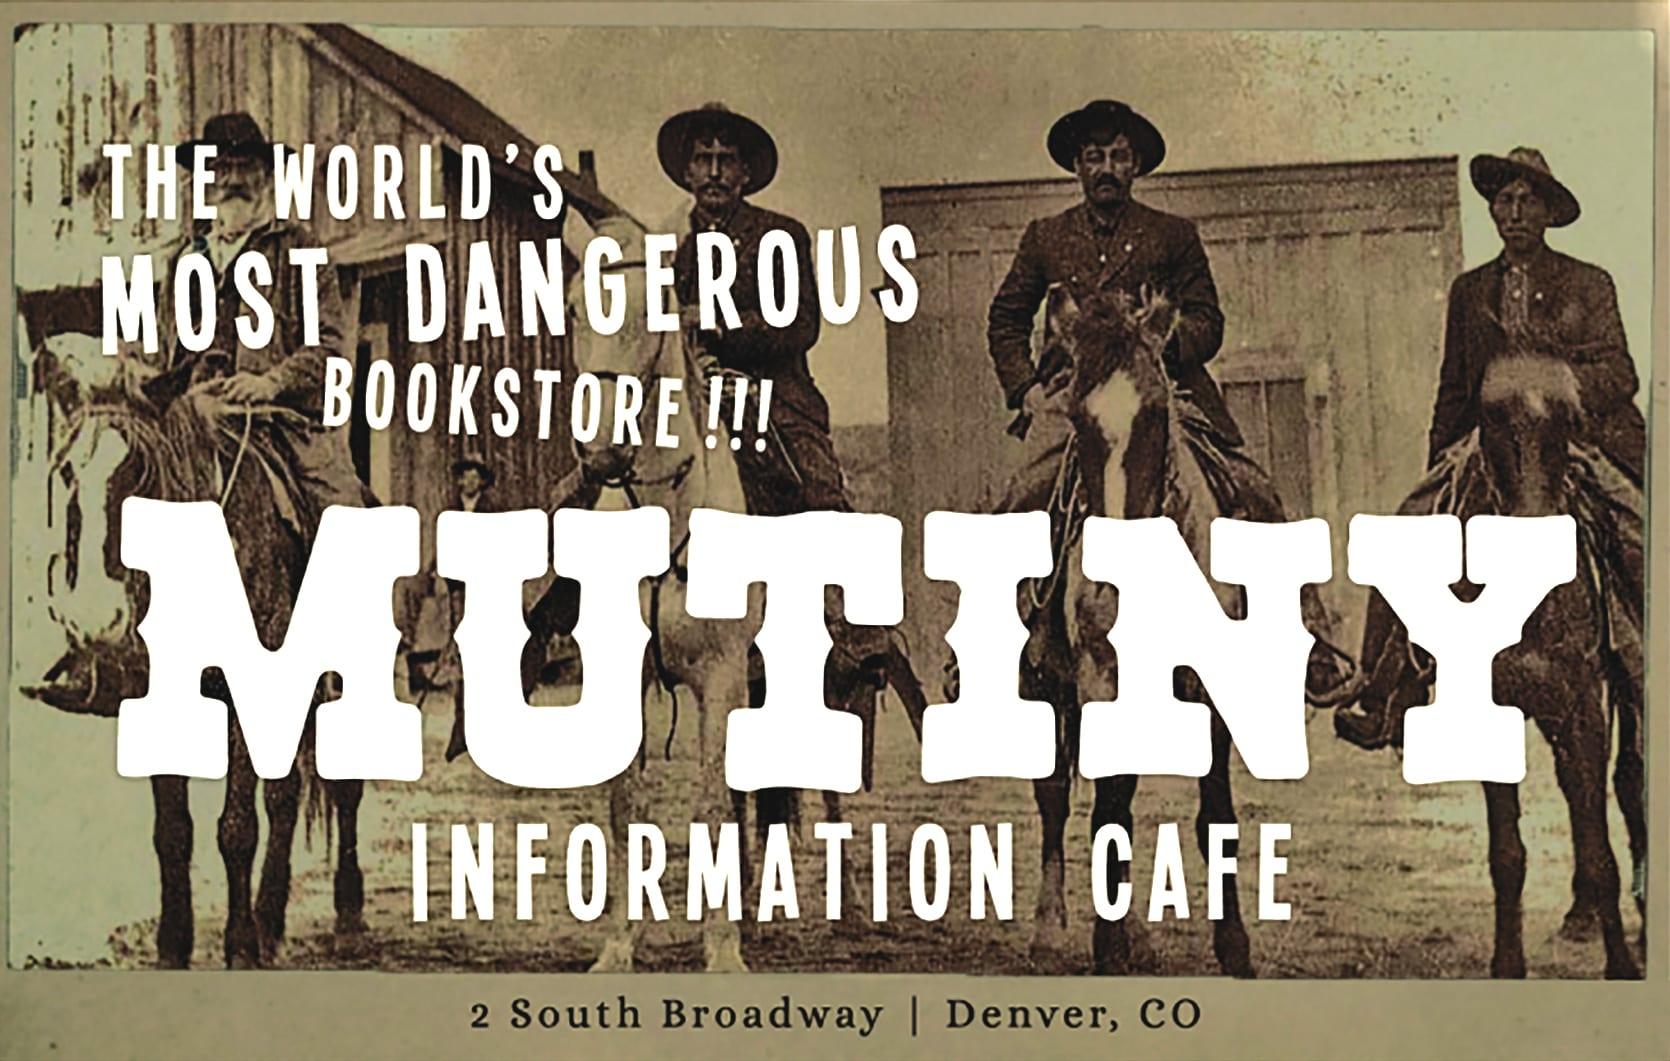 Mutiny Information Cafe ad